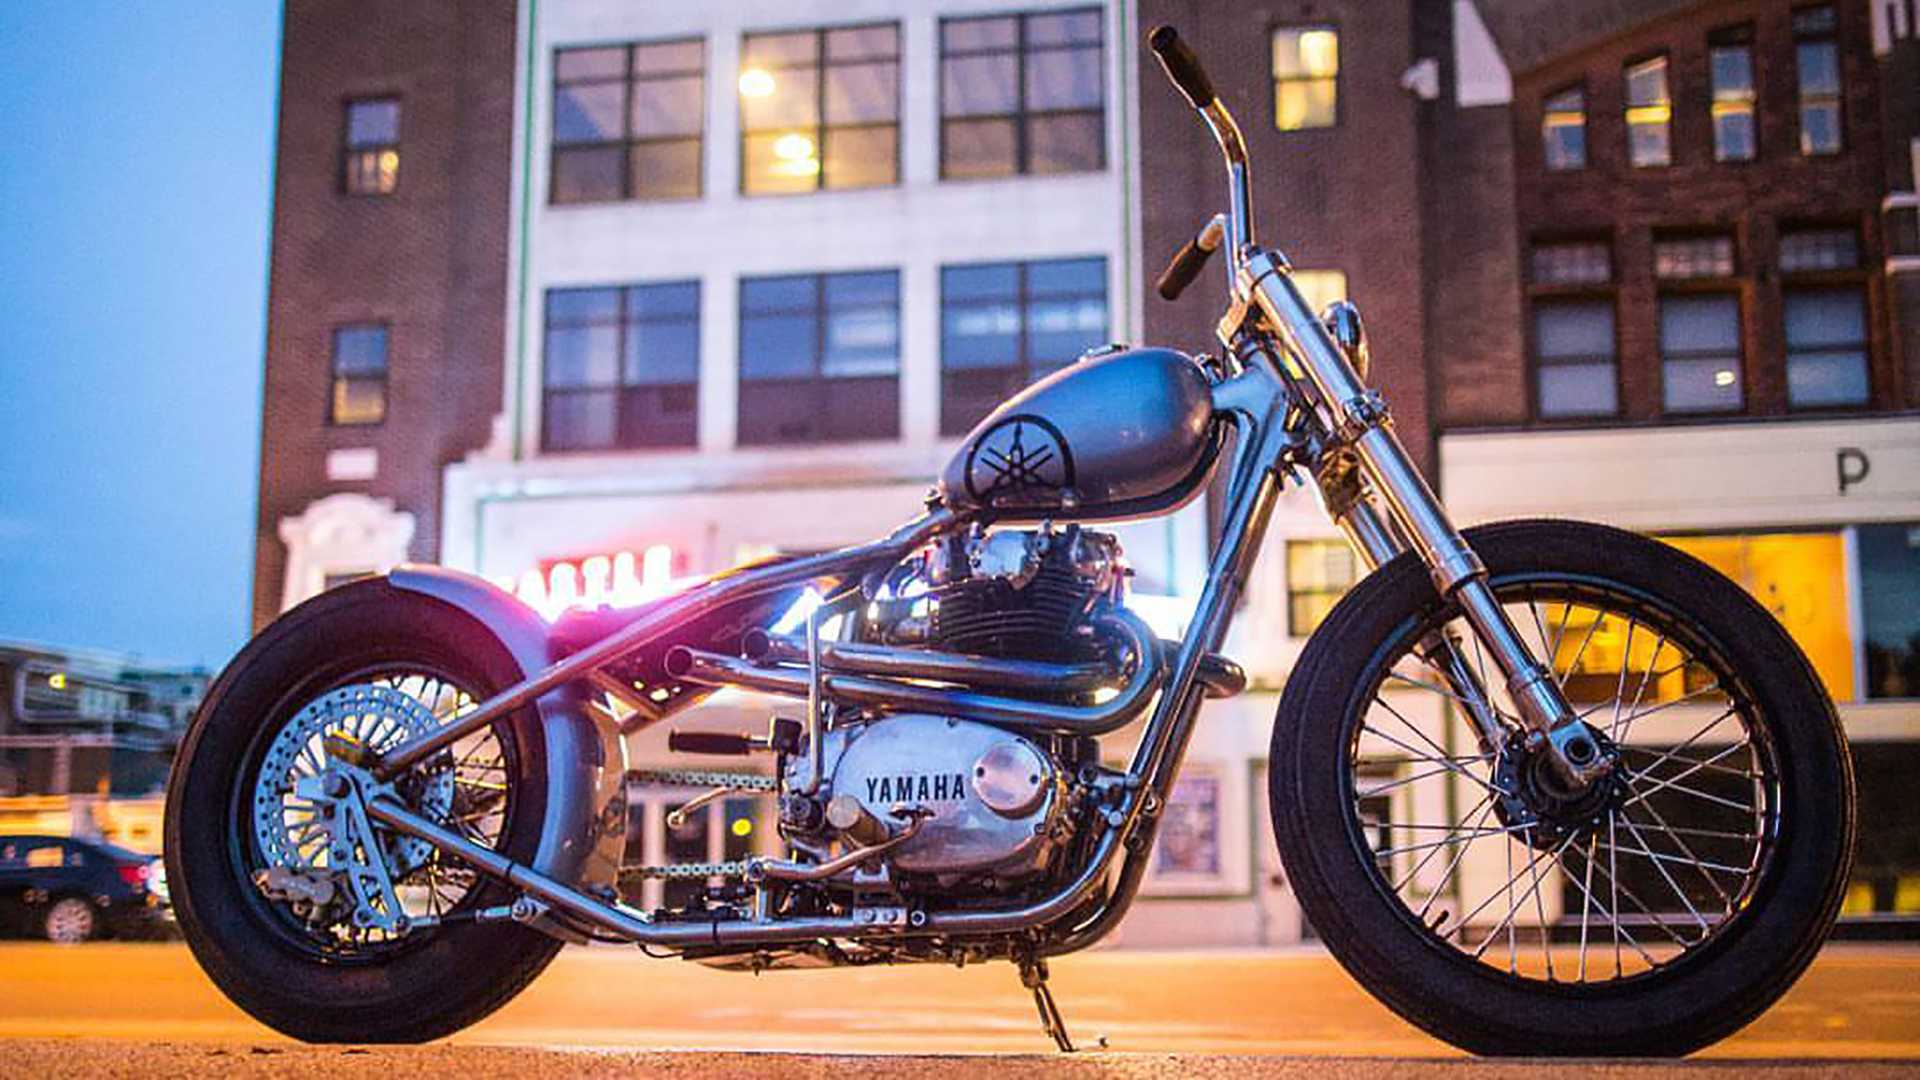 1972 Yamaha XS650 Custom Bobber | RideApart com Photos